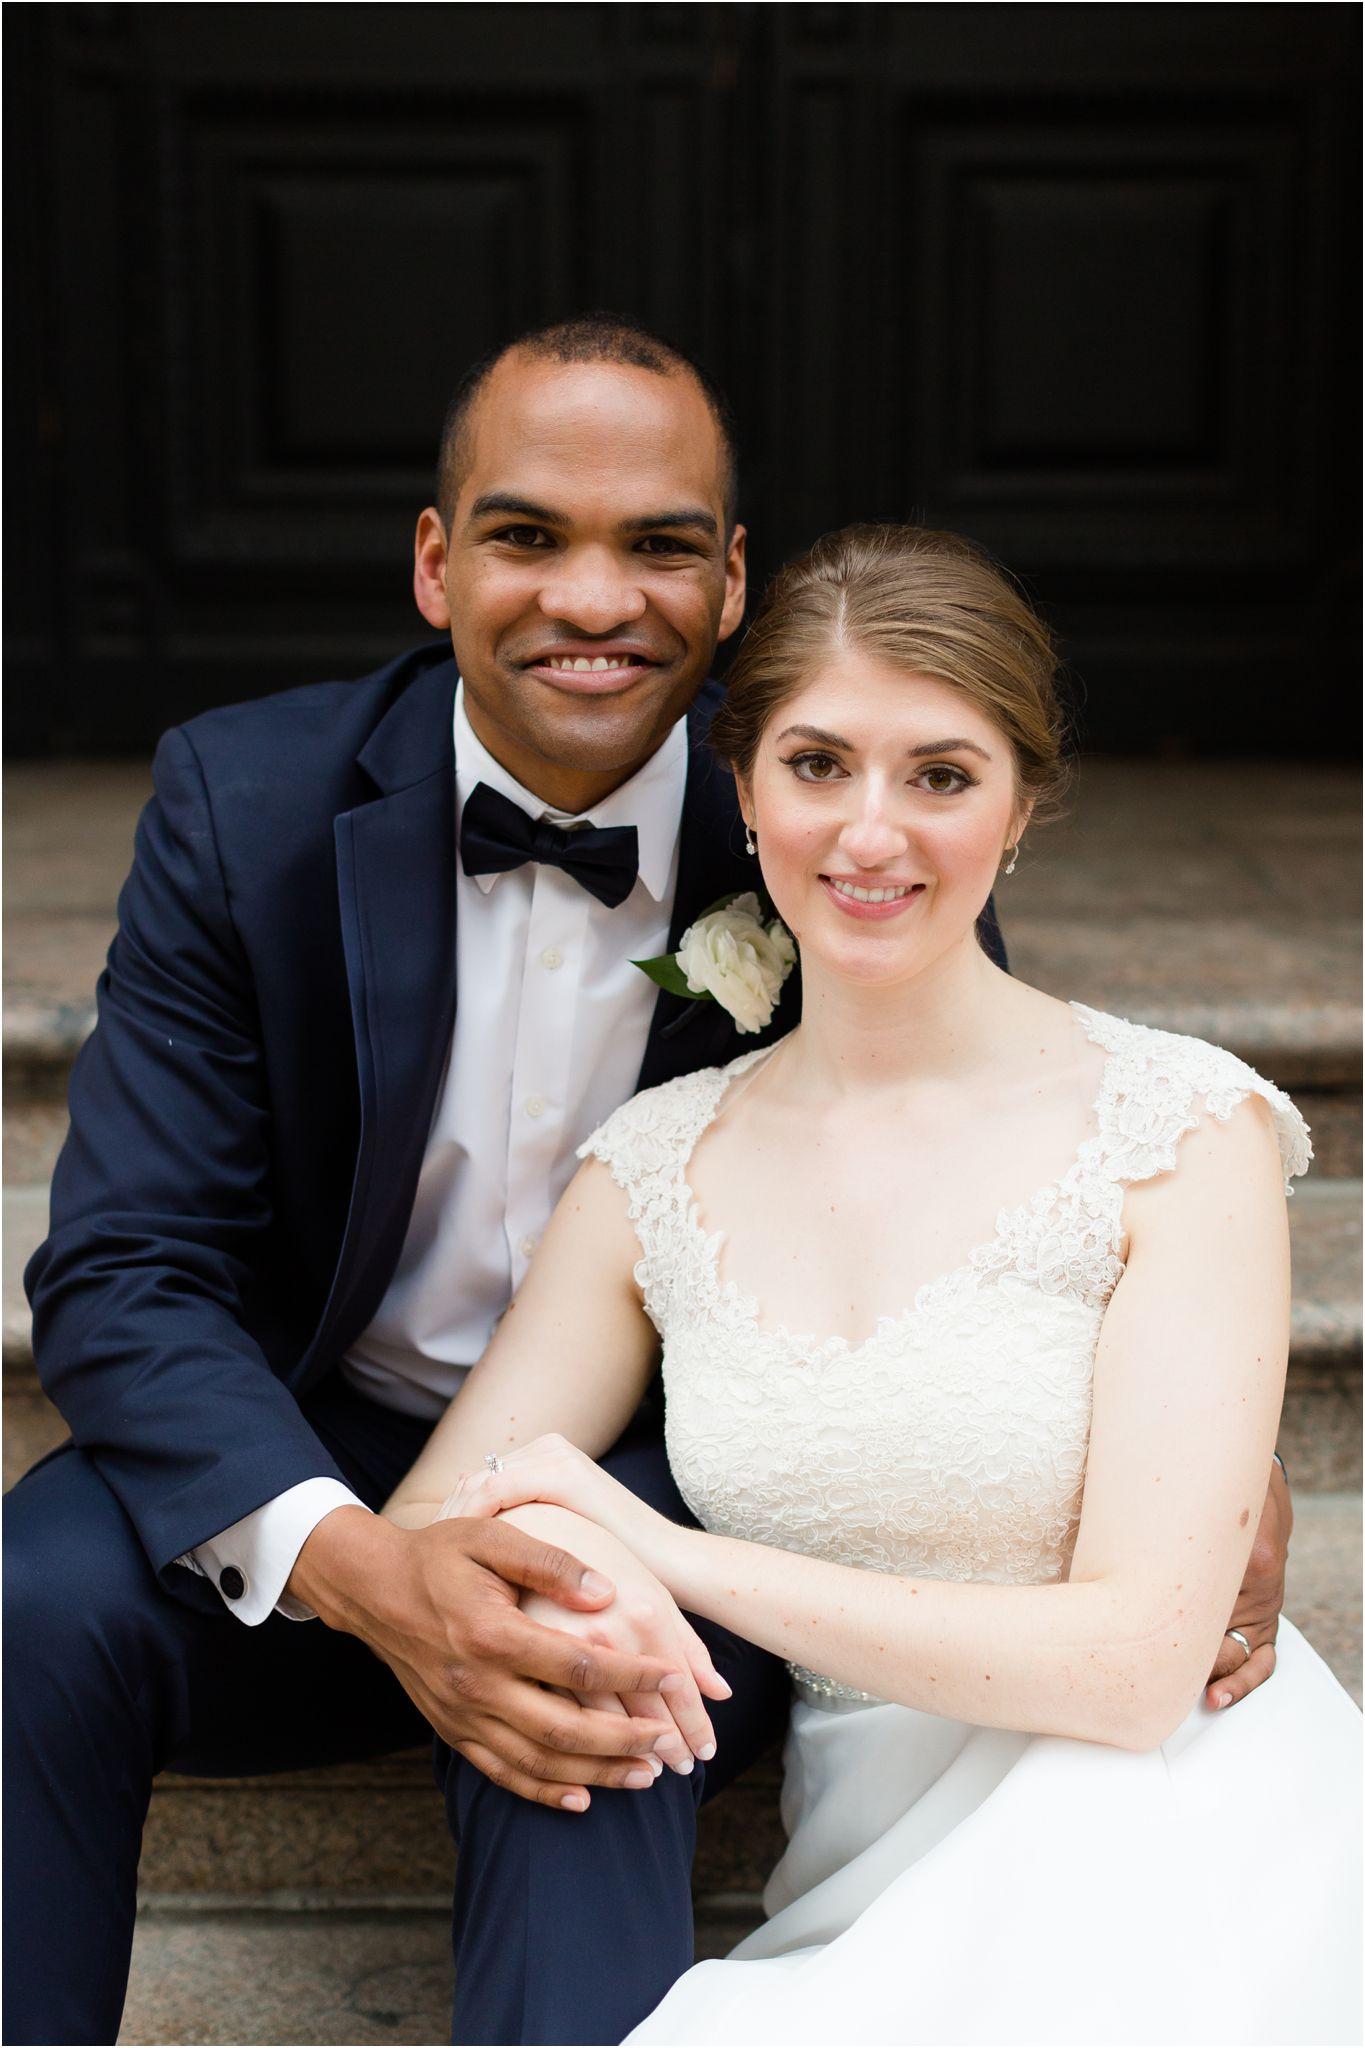 providence-public-library-wedding-images_00027.JPG